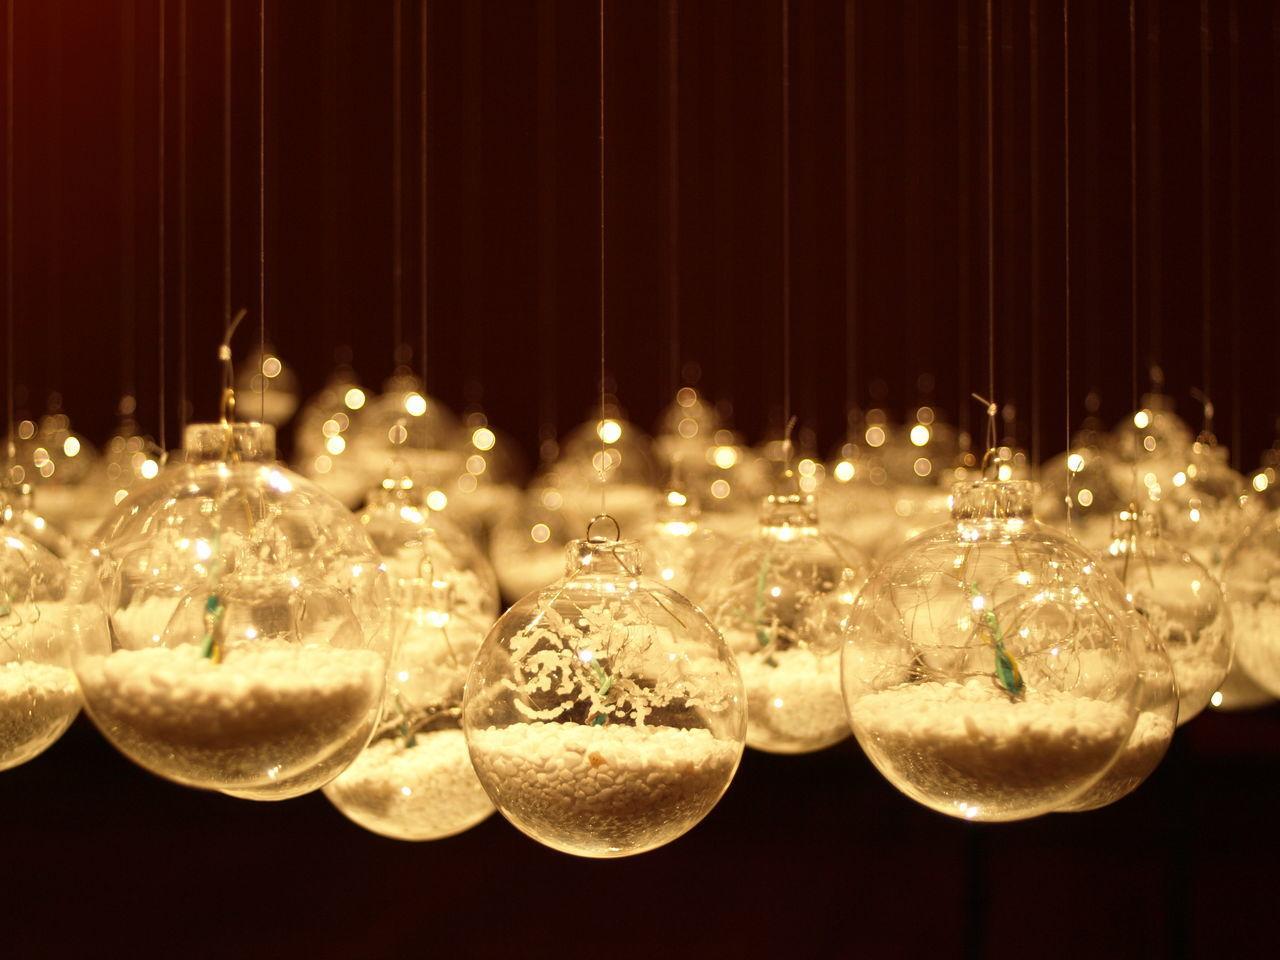 CLOSE-UP OF ILLUMINATED LANTERNS HANGING IN GLASS